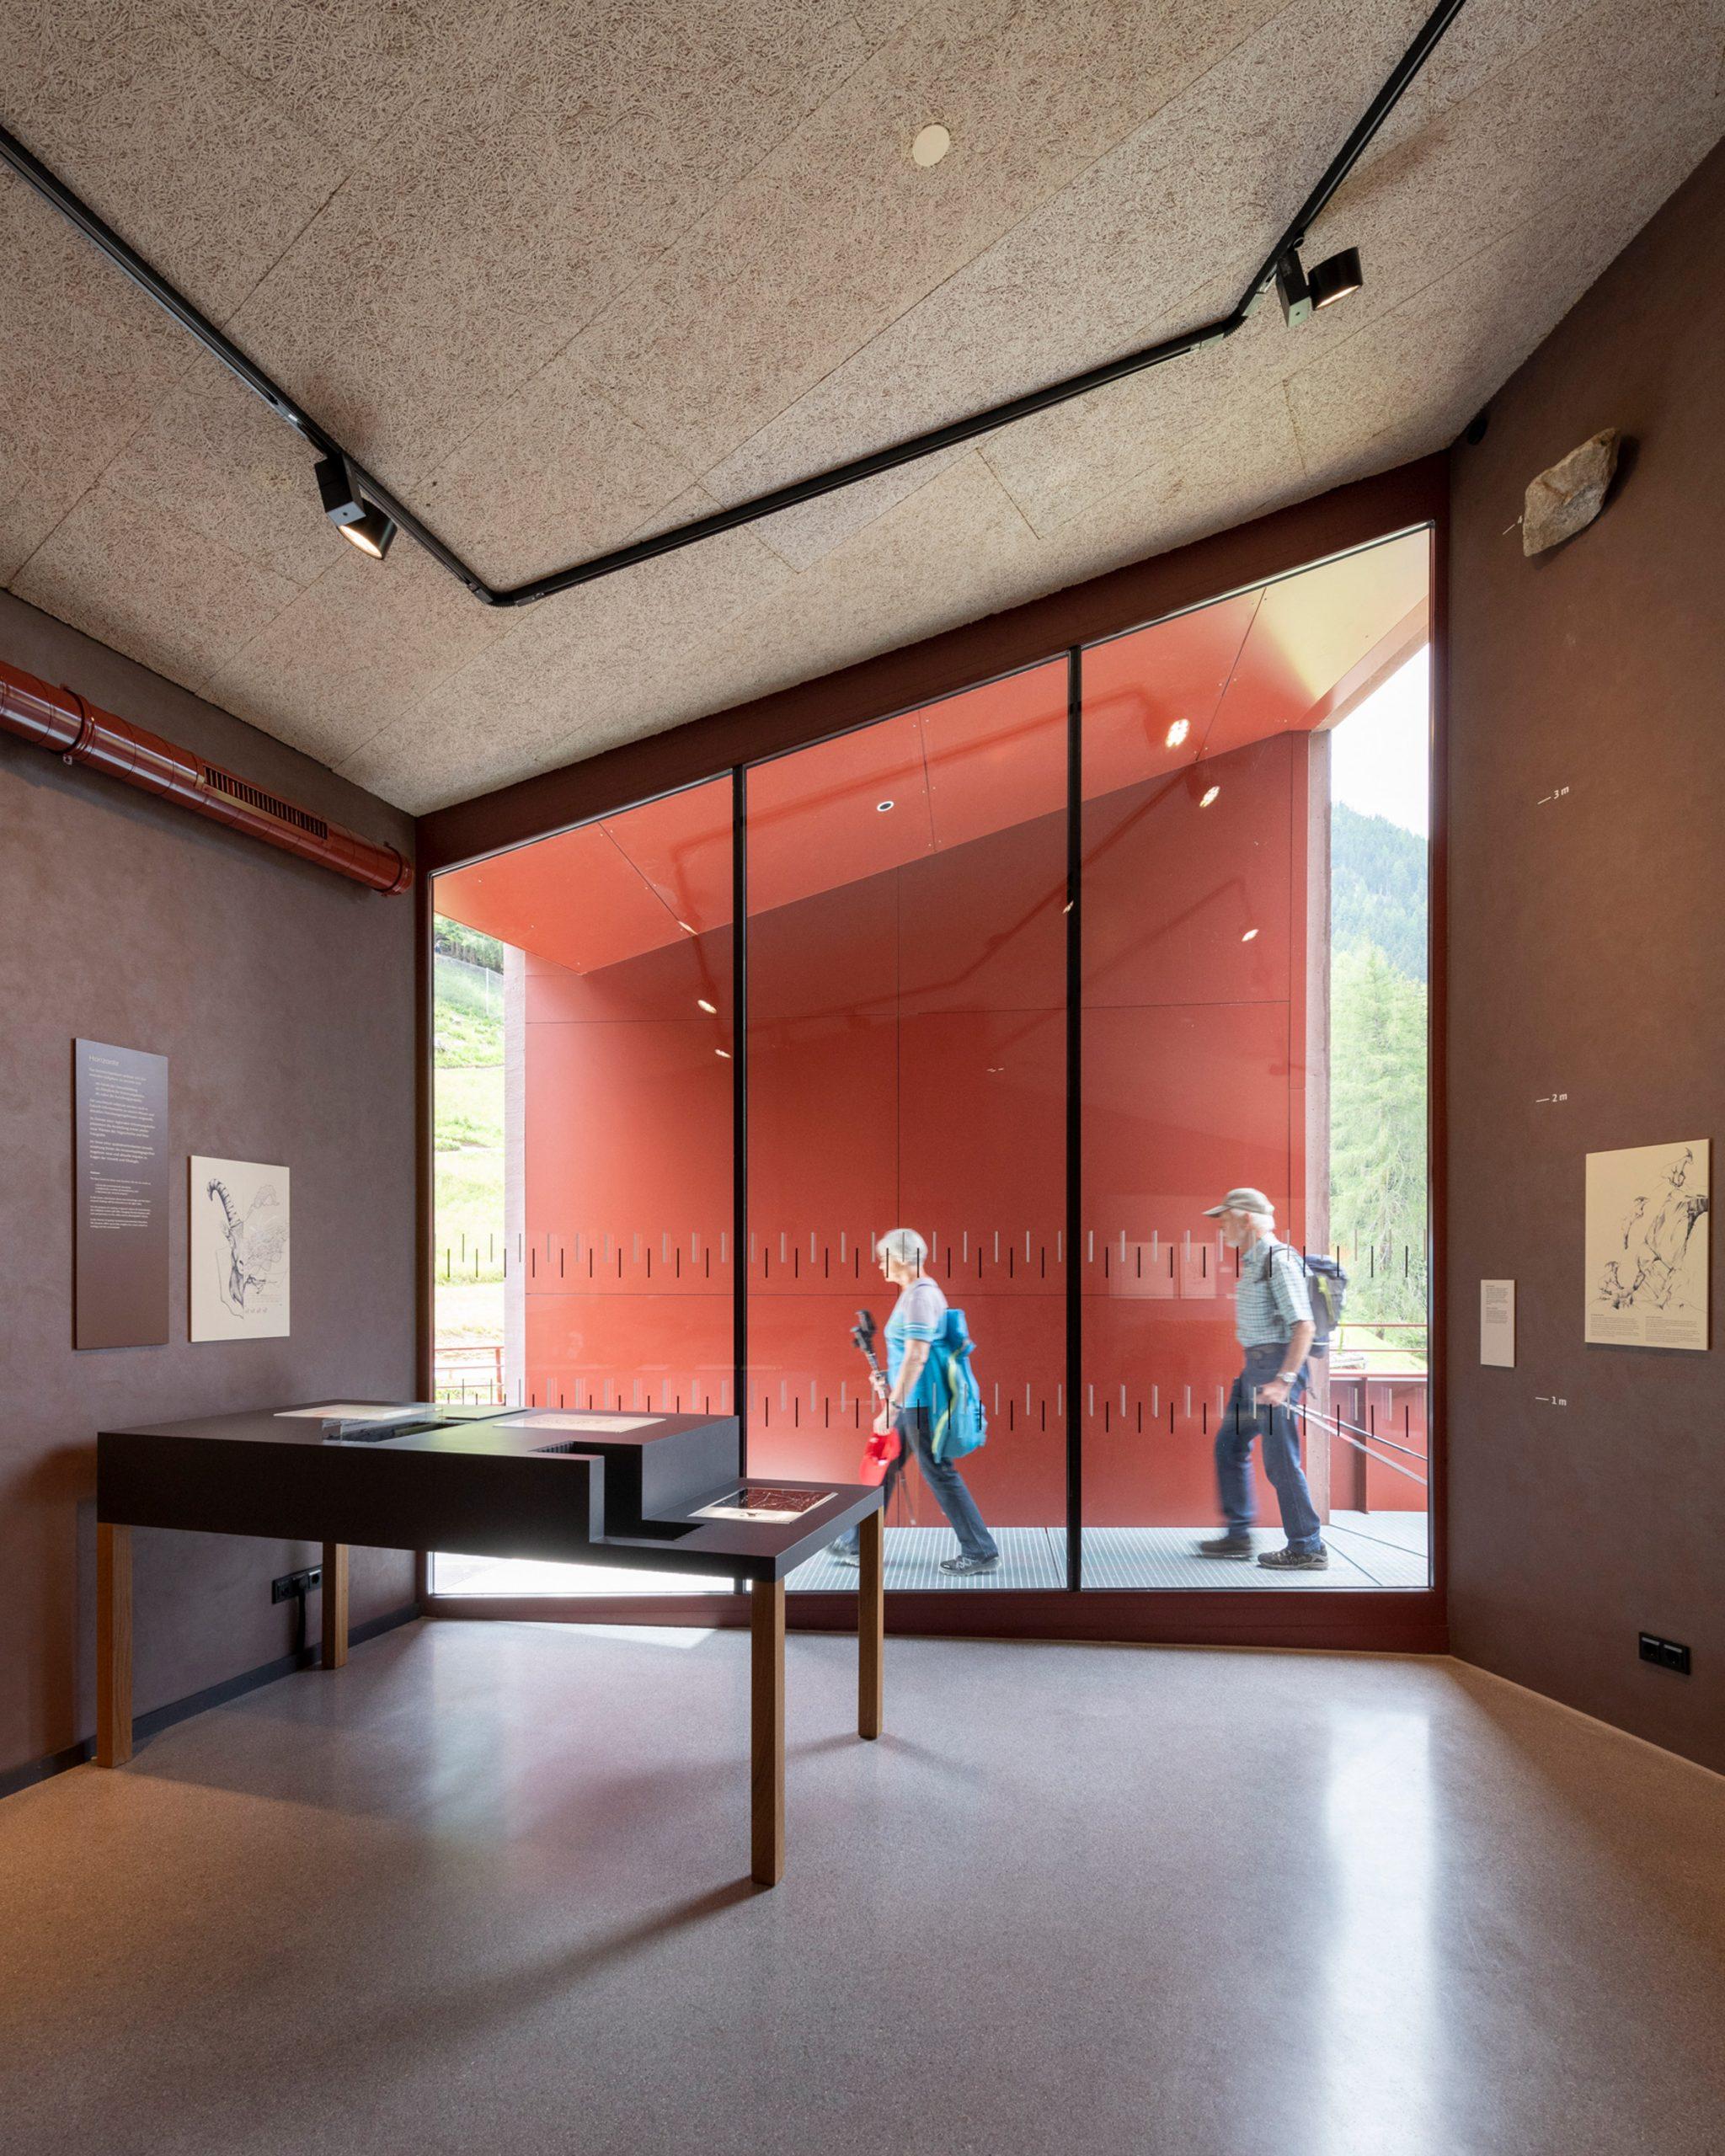 Top floor of Ibex Museum St Leonhard by Daniela Kröss and Rainer Köberl